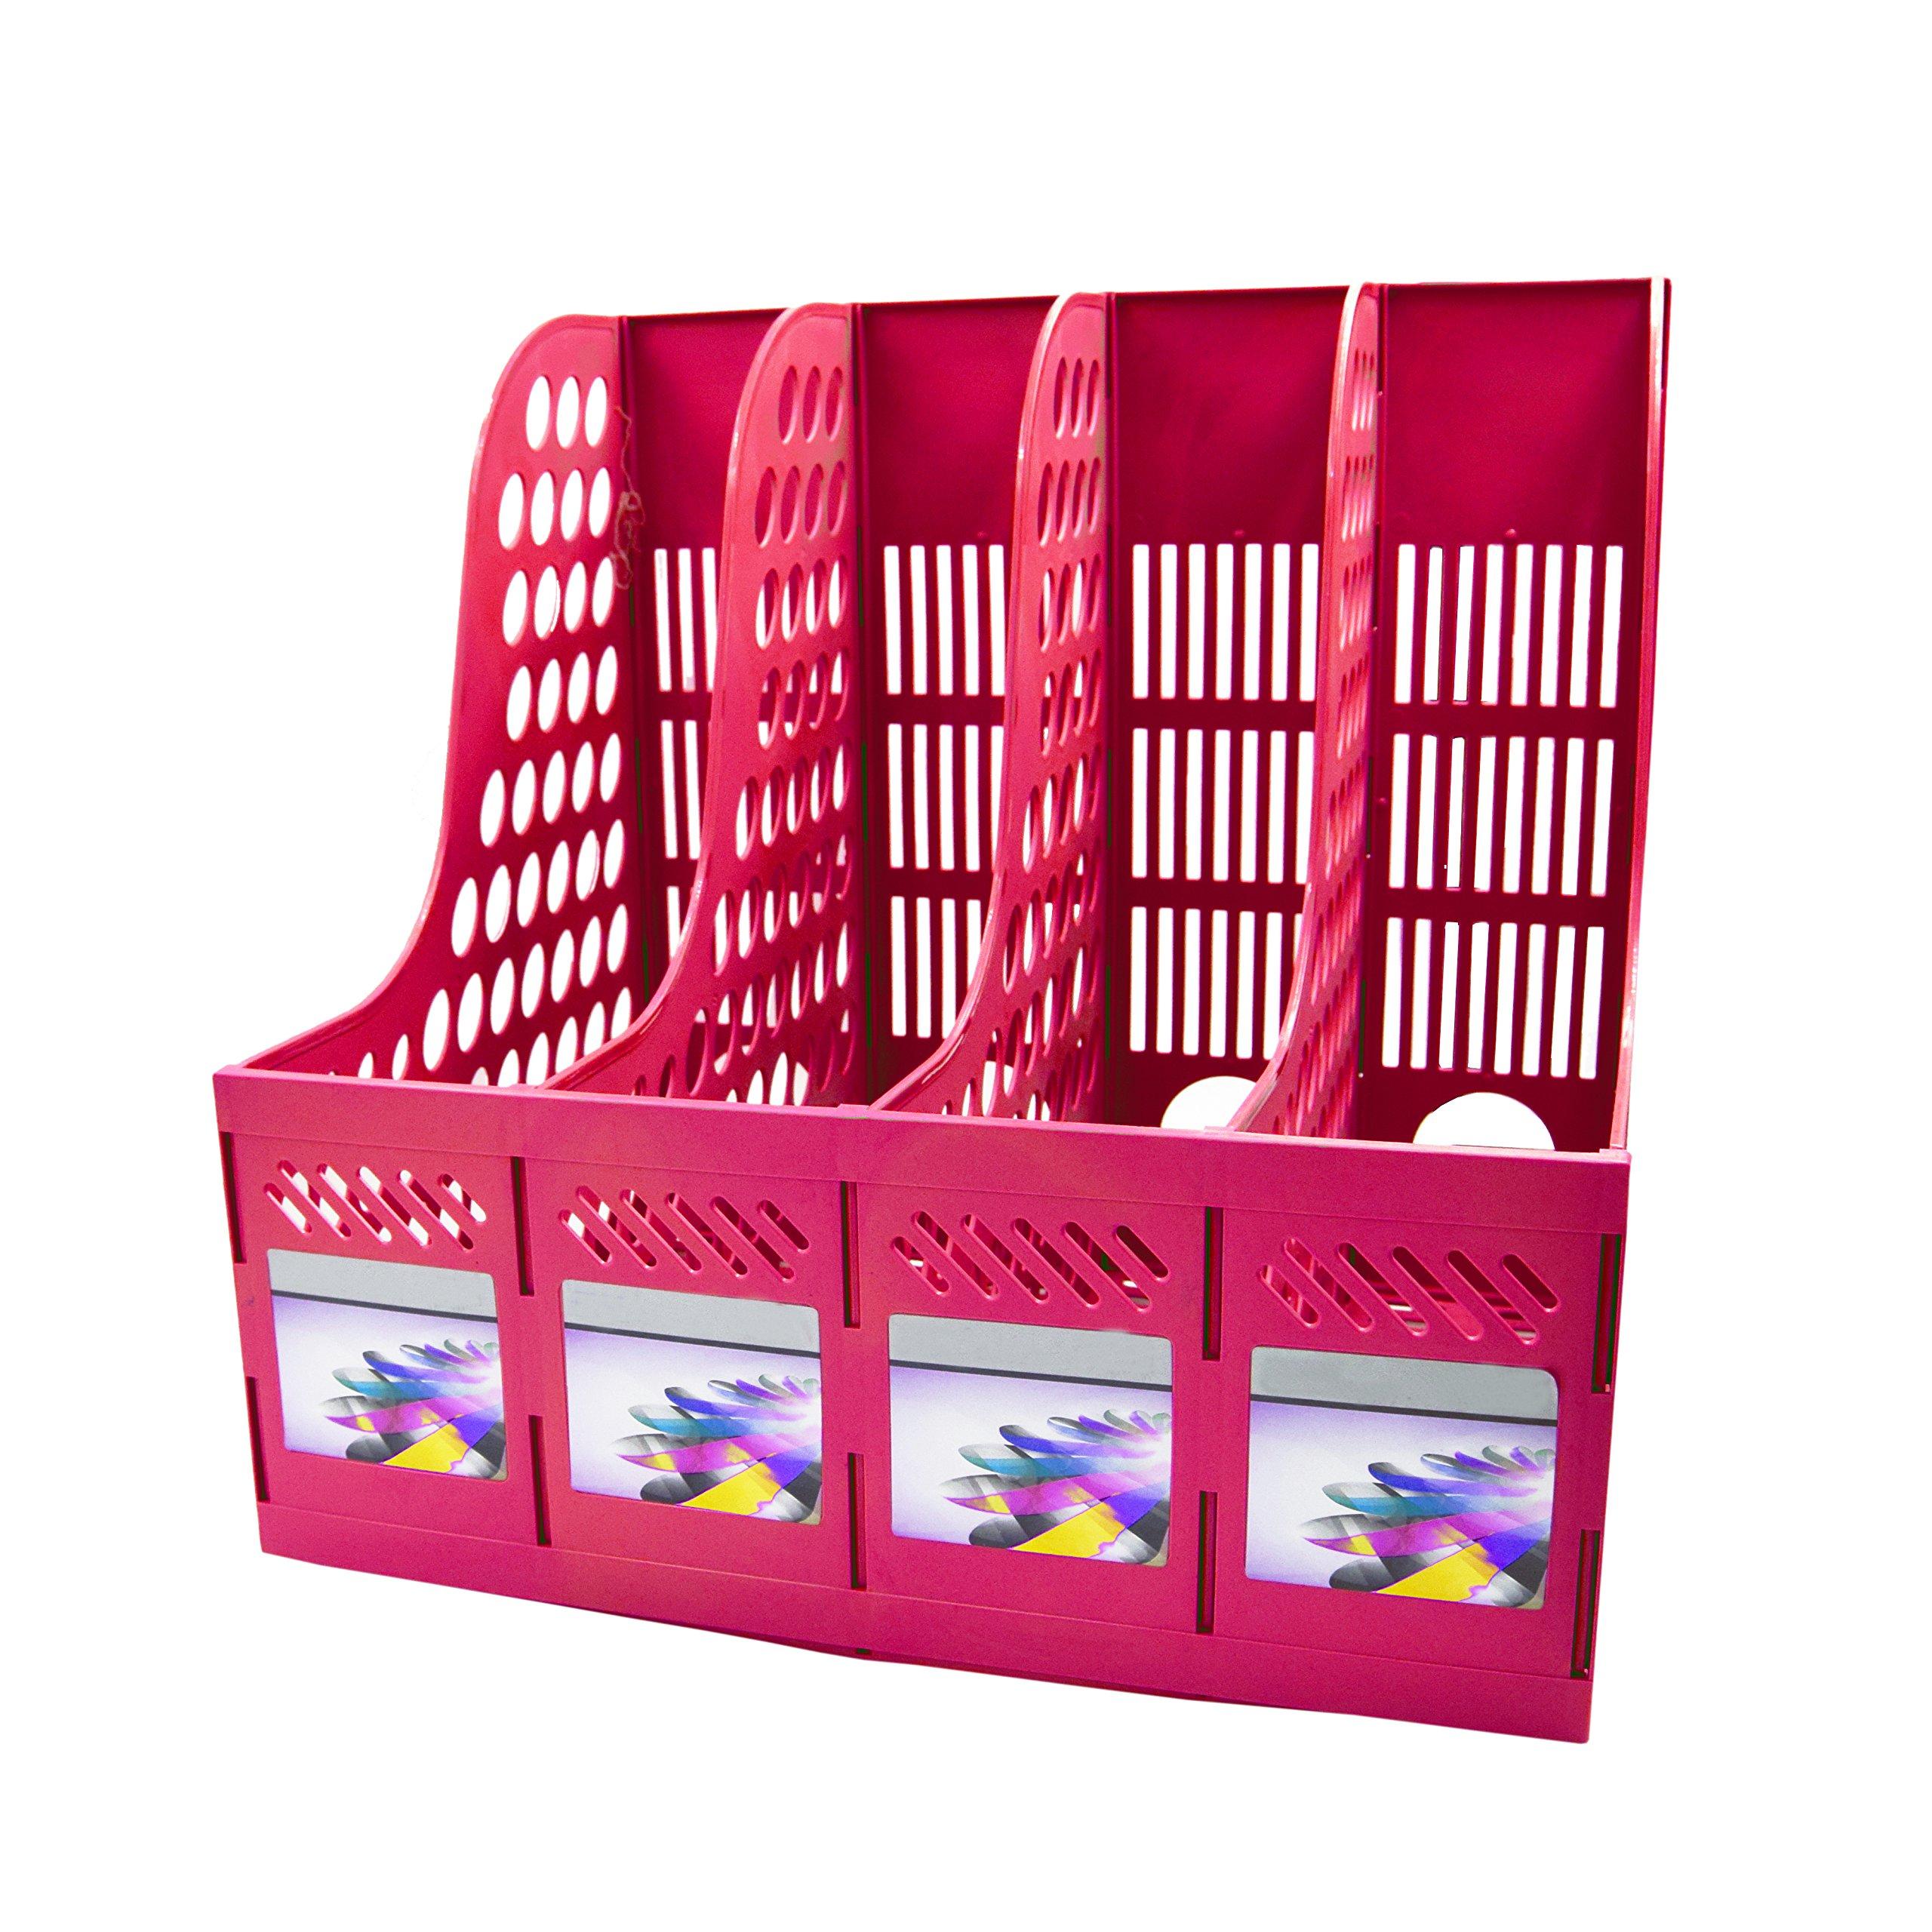 Magazine File Holder,SAYEEC Sturdy Desktop Quadruplicate Magazine Literature Plastic Holders Frames File Dividers Document Cabinet Rack Display and Storage Organiser Box (Pink)